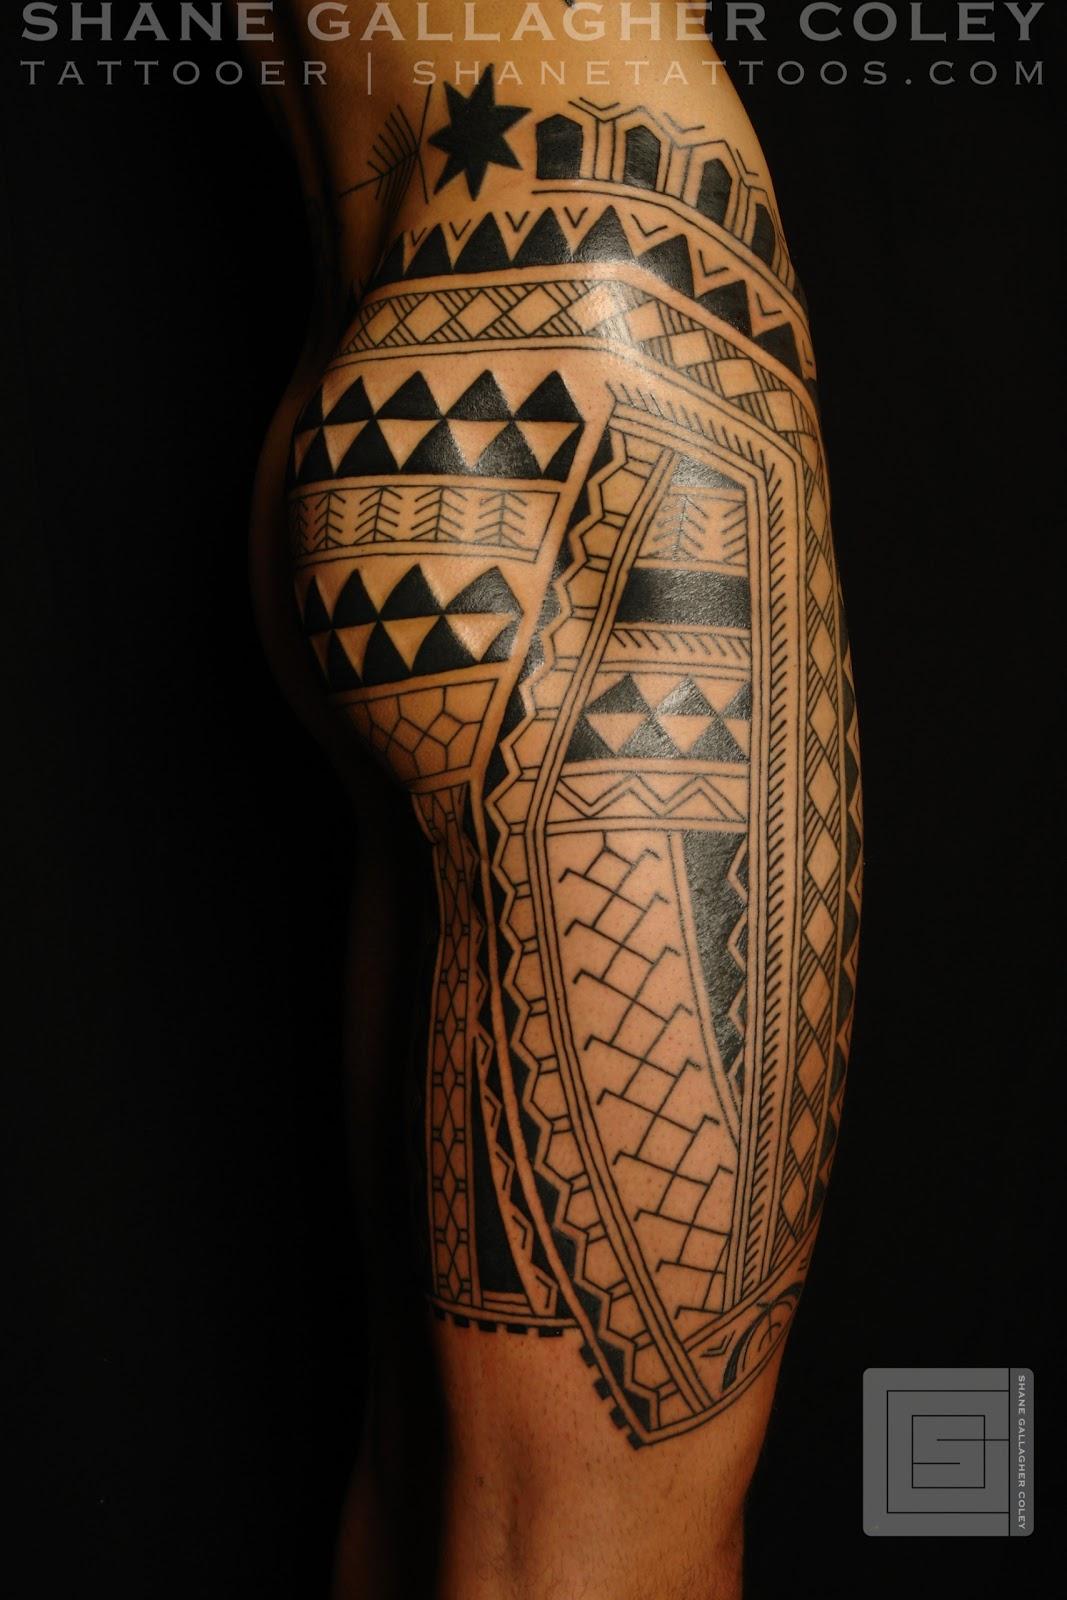 leg tattoos photo - 3